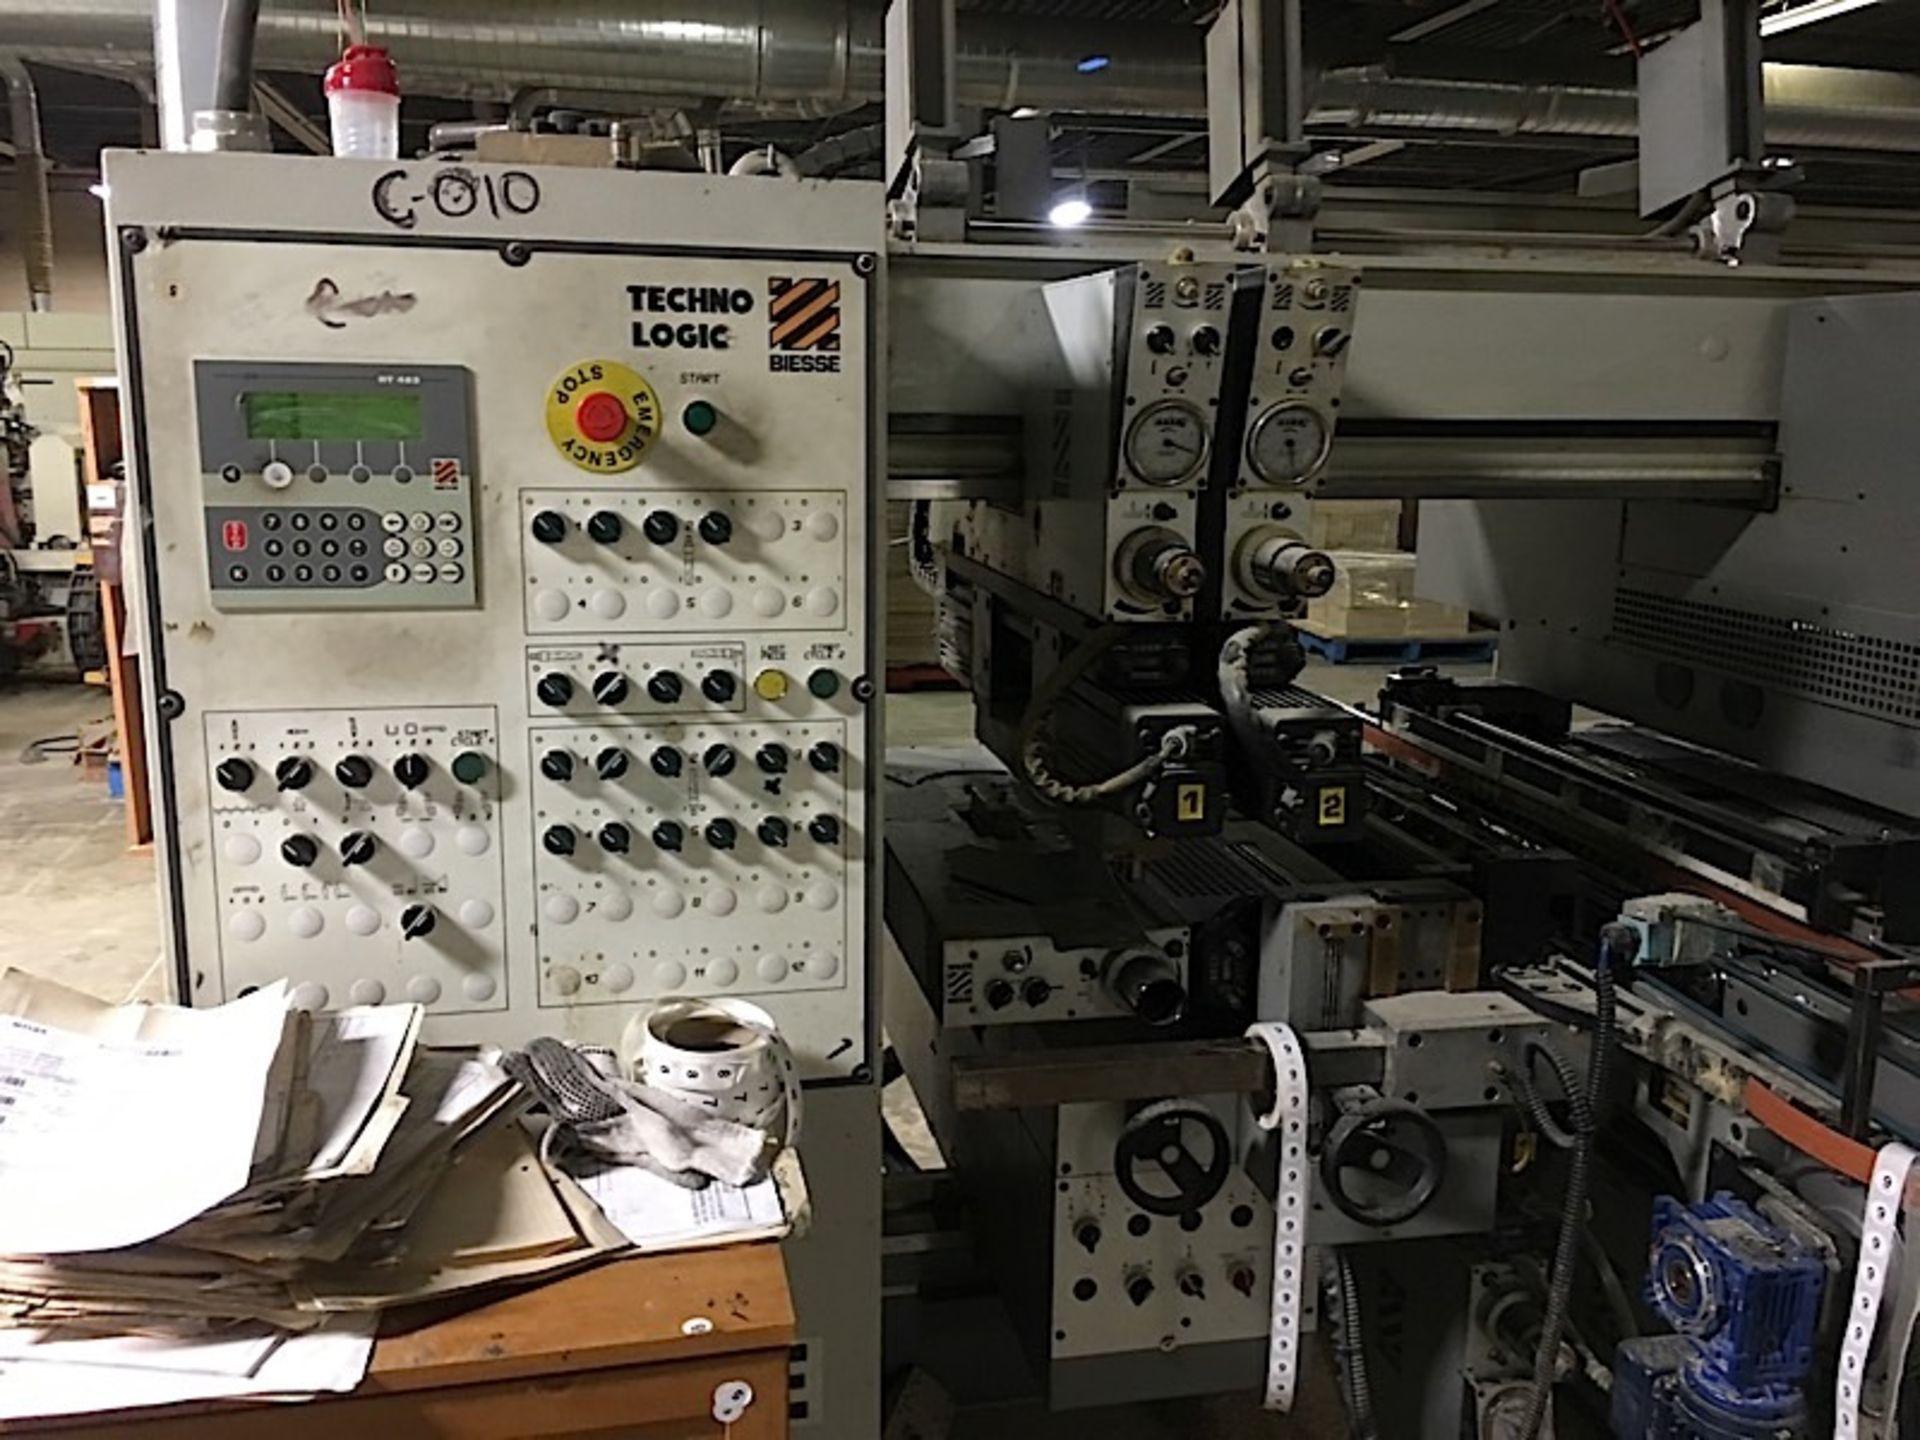 BIESSE (TECHNO) CNC FEED THROUGH BORING MACHINE - Image 3 of 4